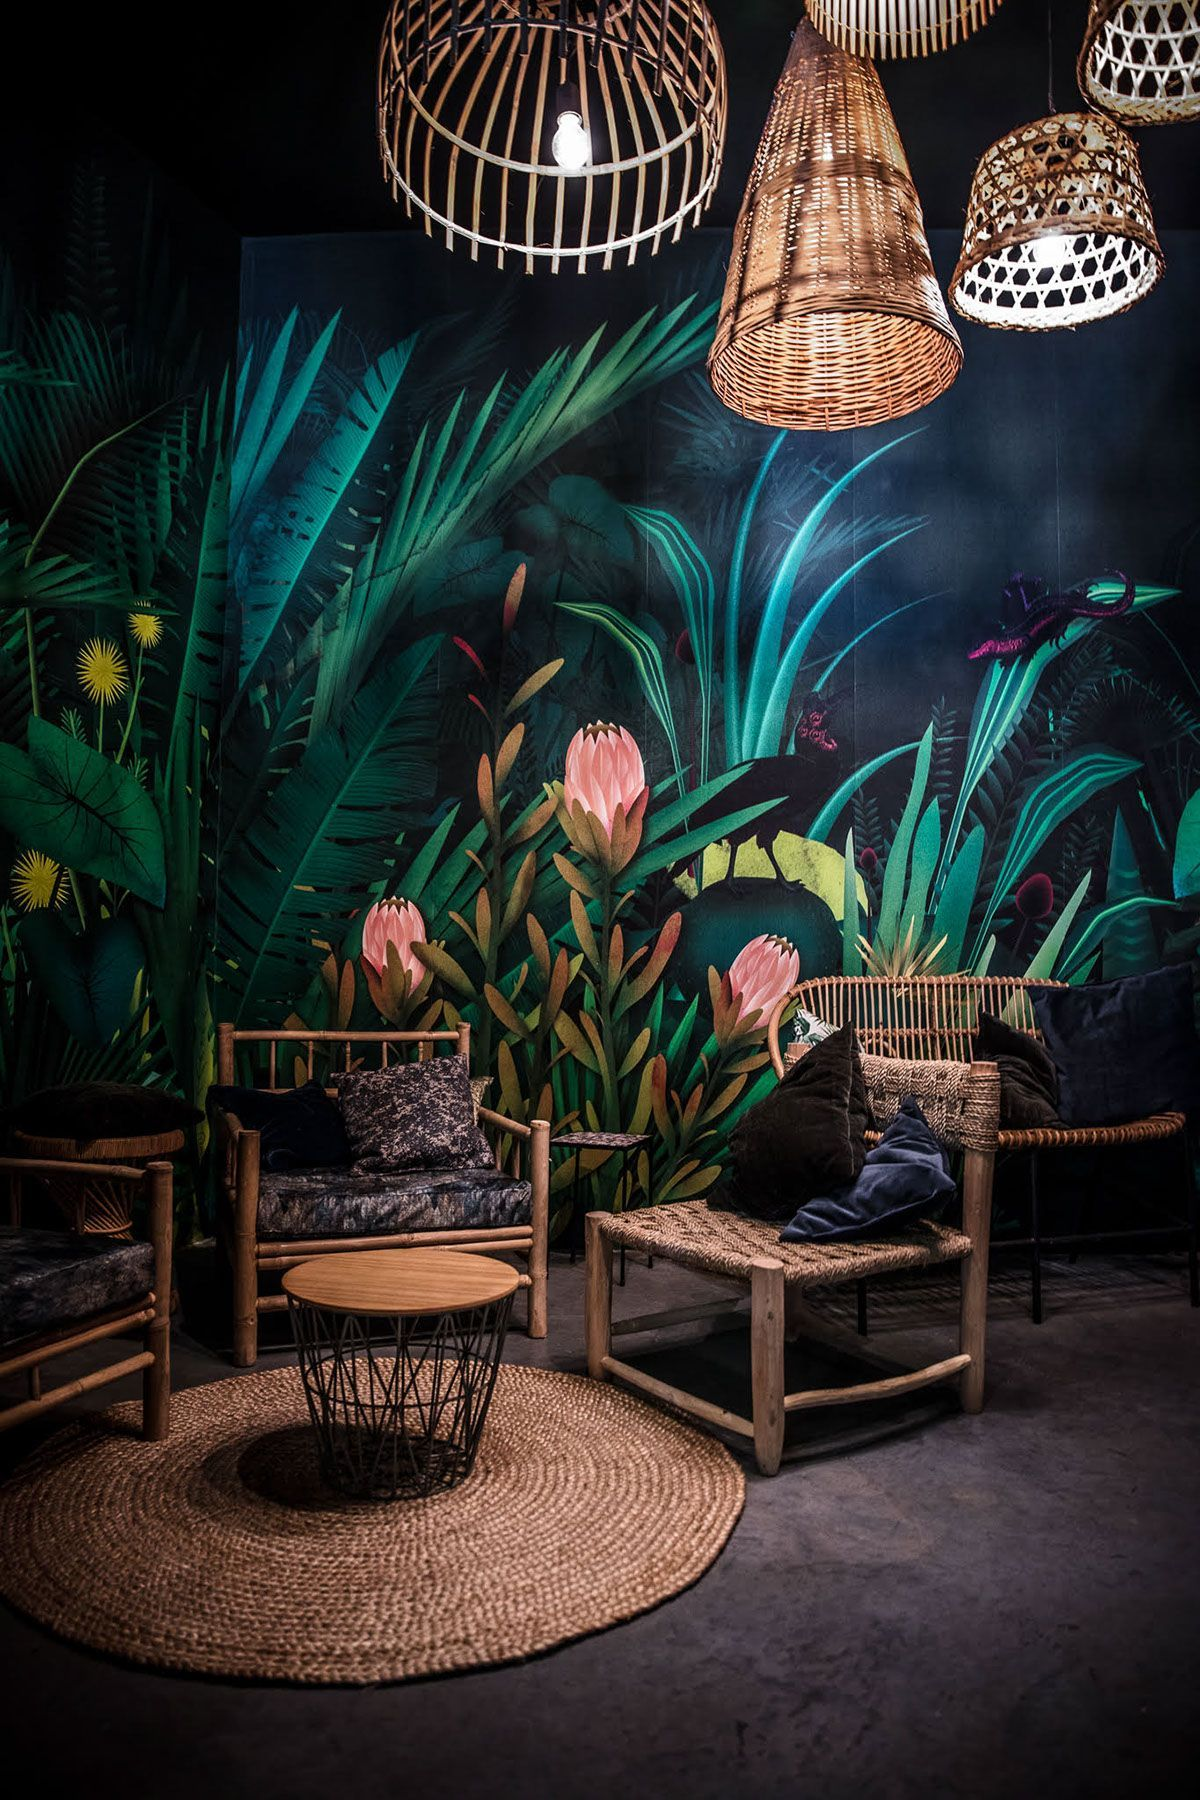 Wandmalerei im zimmer bar palmier interior design by xavier segers u fubiz media  living